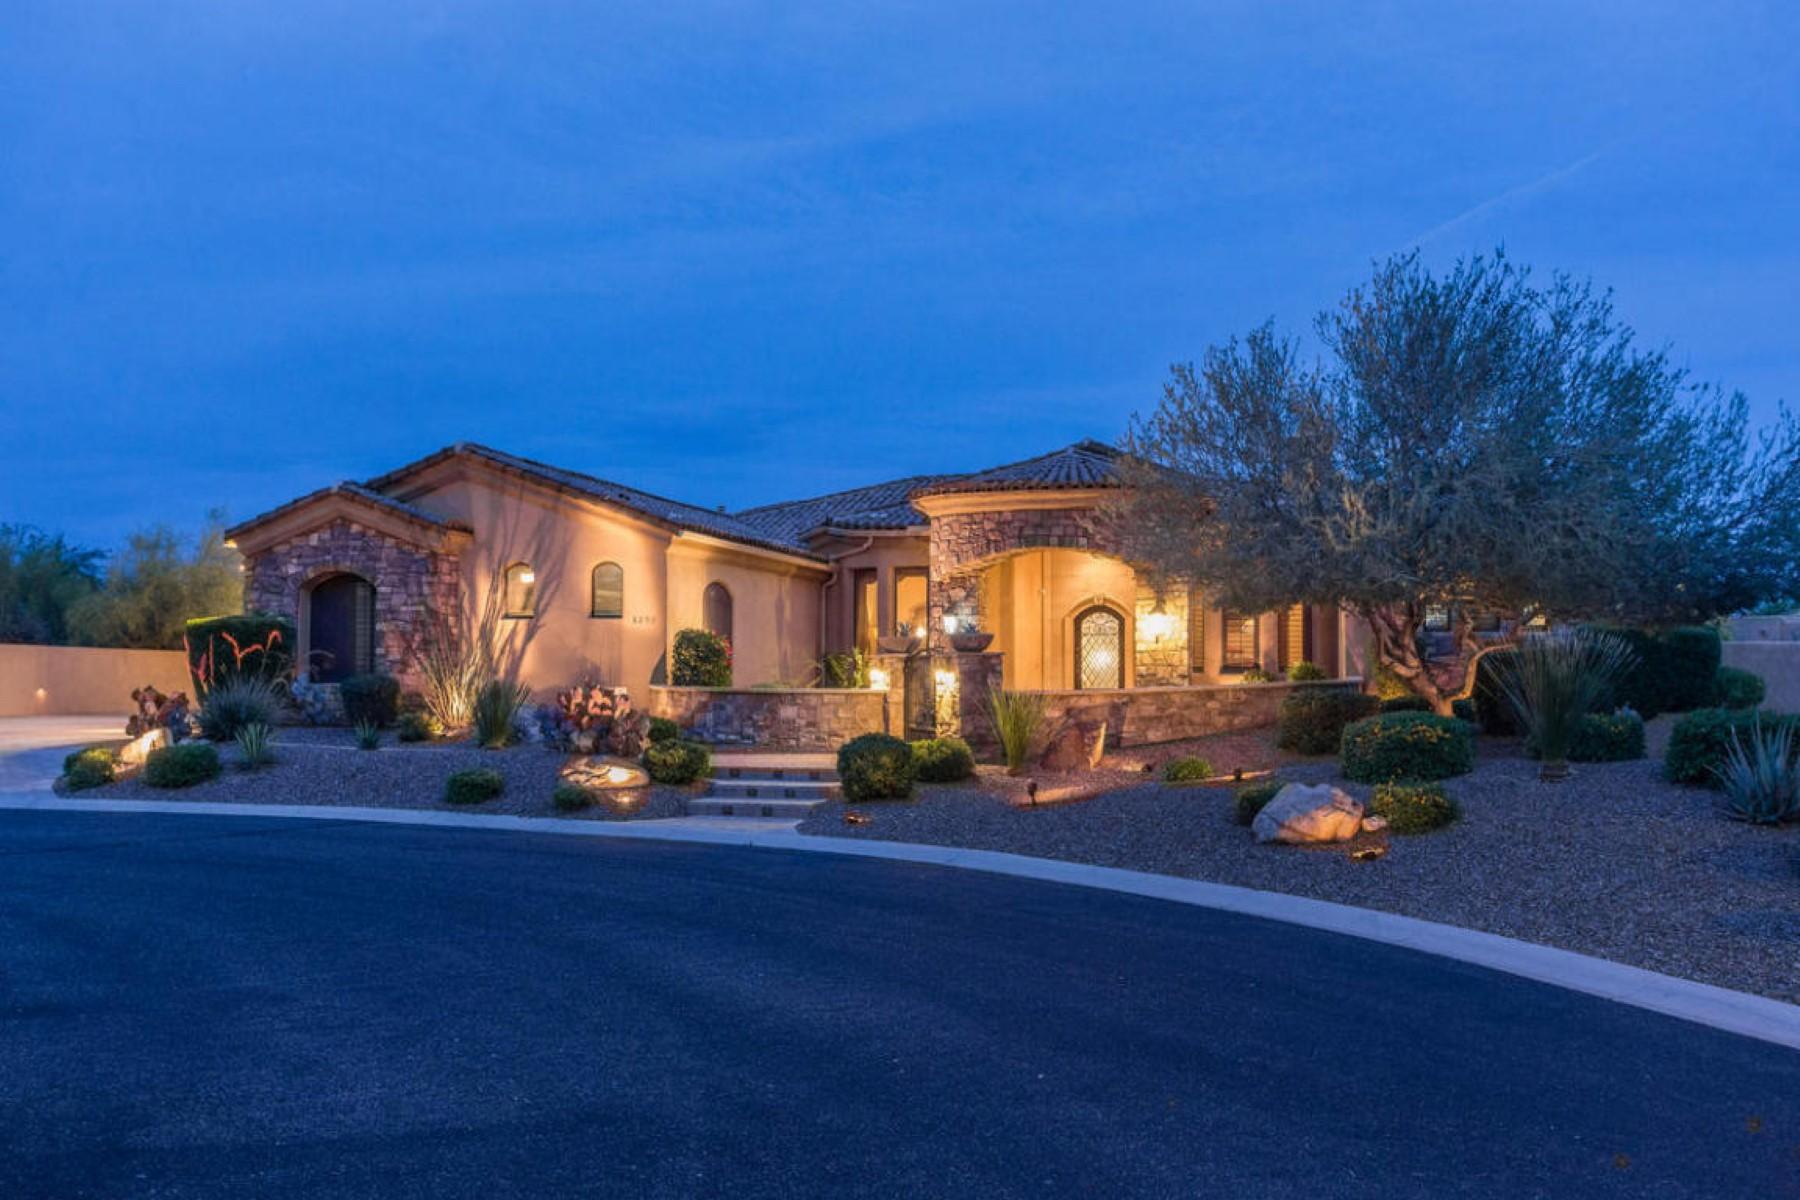 獨棟家庭住宅 為 出售 在 Beautiful well appointed tuscan custom home 8253 E KRAMER CIR Mesa, 亞利桑那州 85207 美國